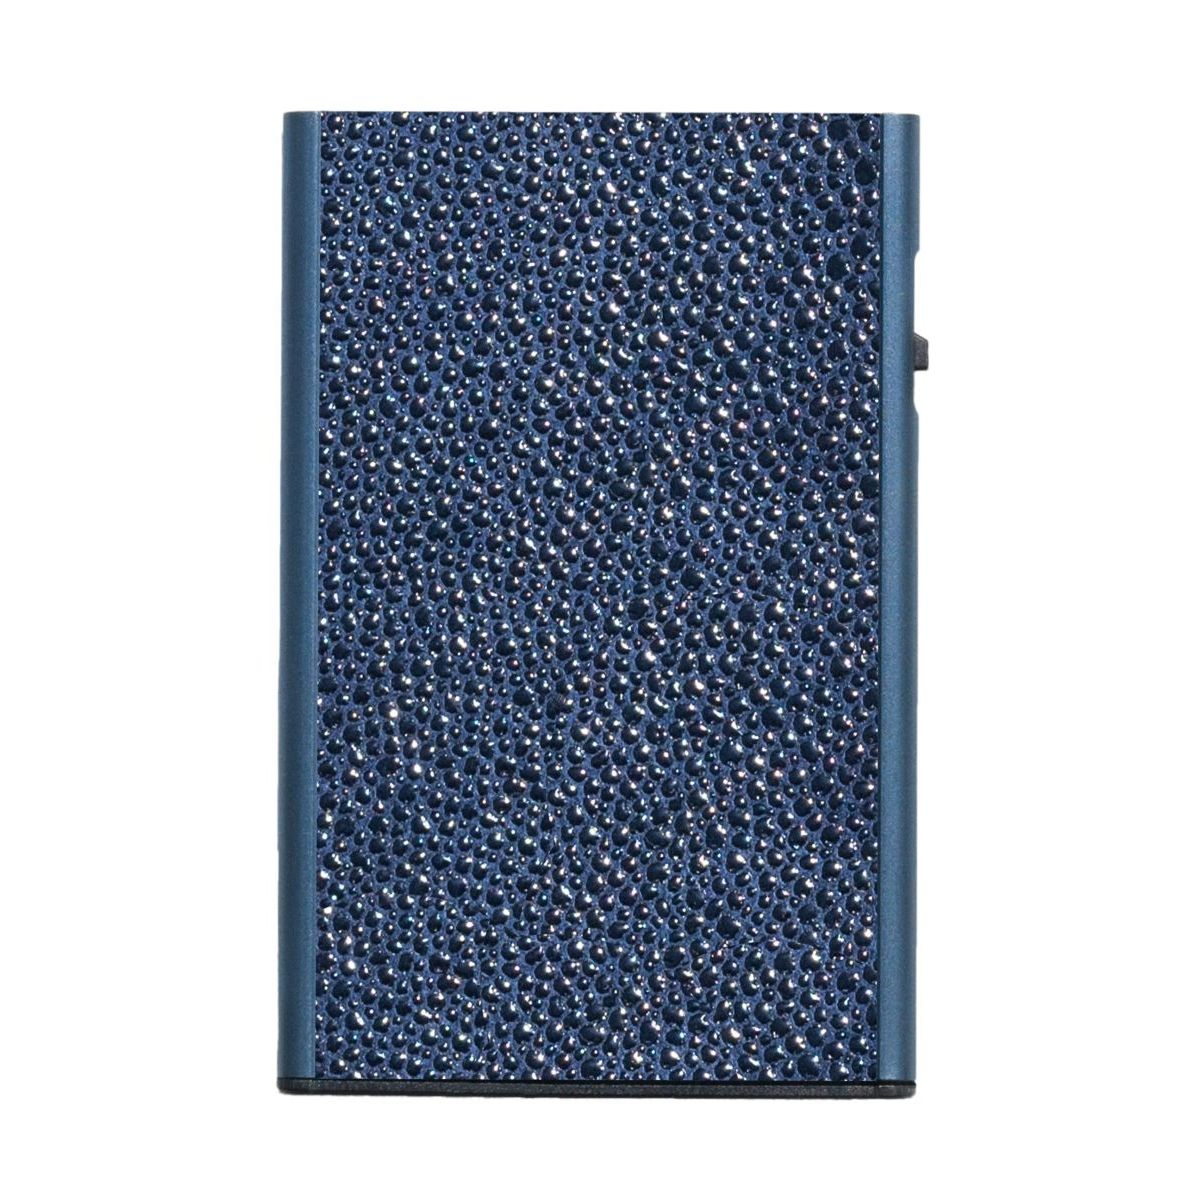 TRU VIRTU Card Case Click n Slide Wallet - Sting Ray Blue